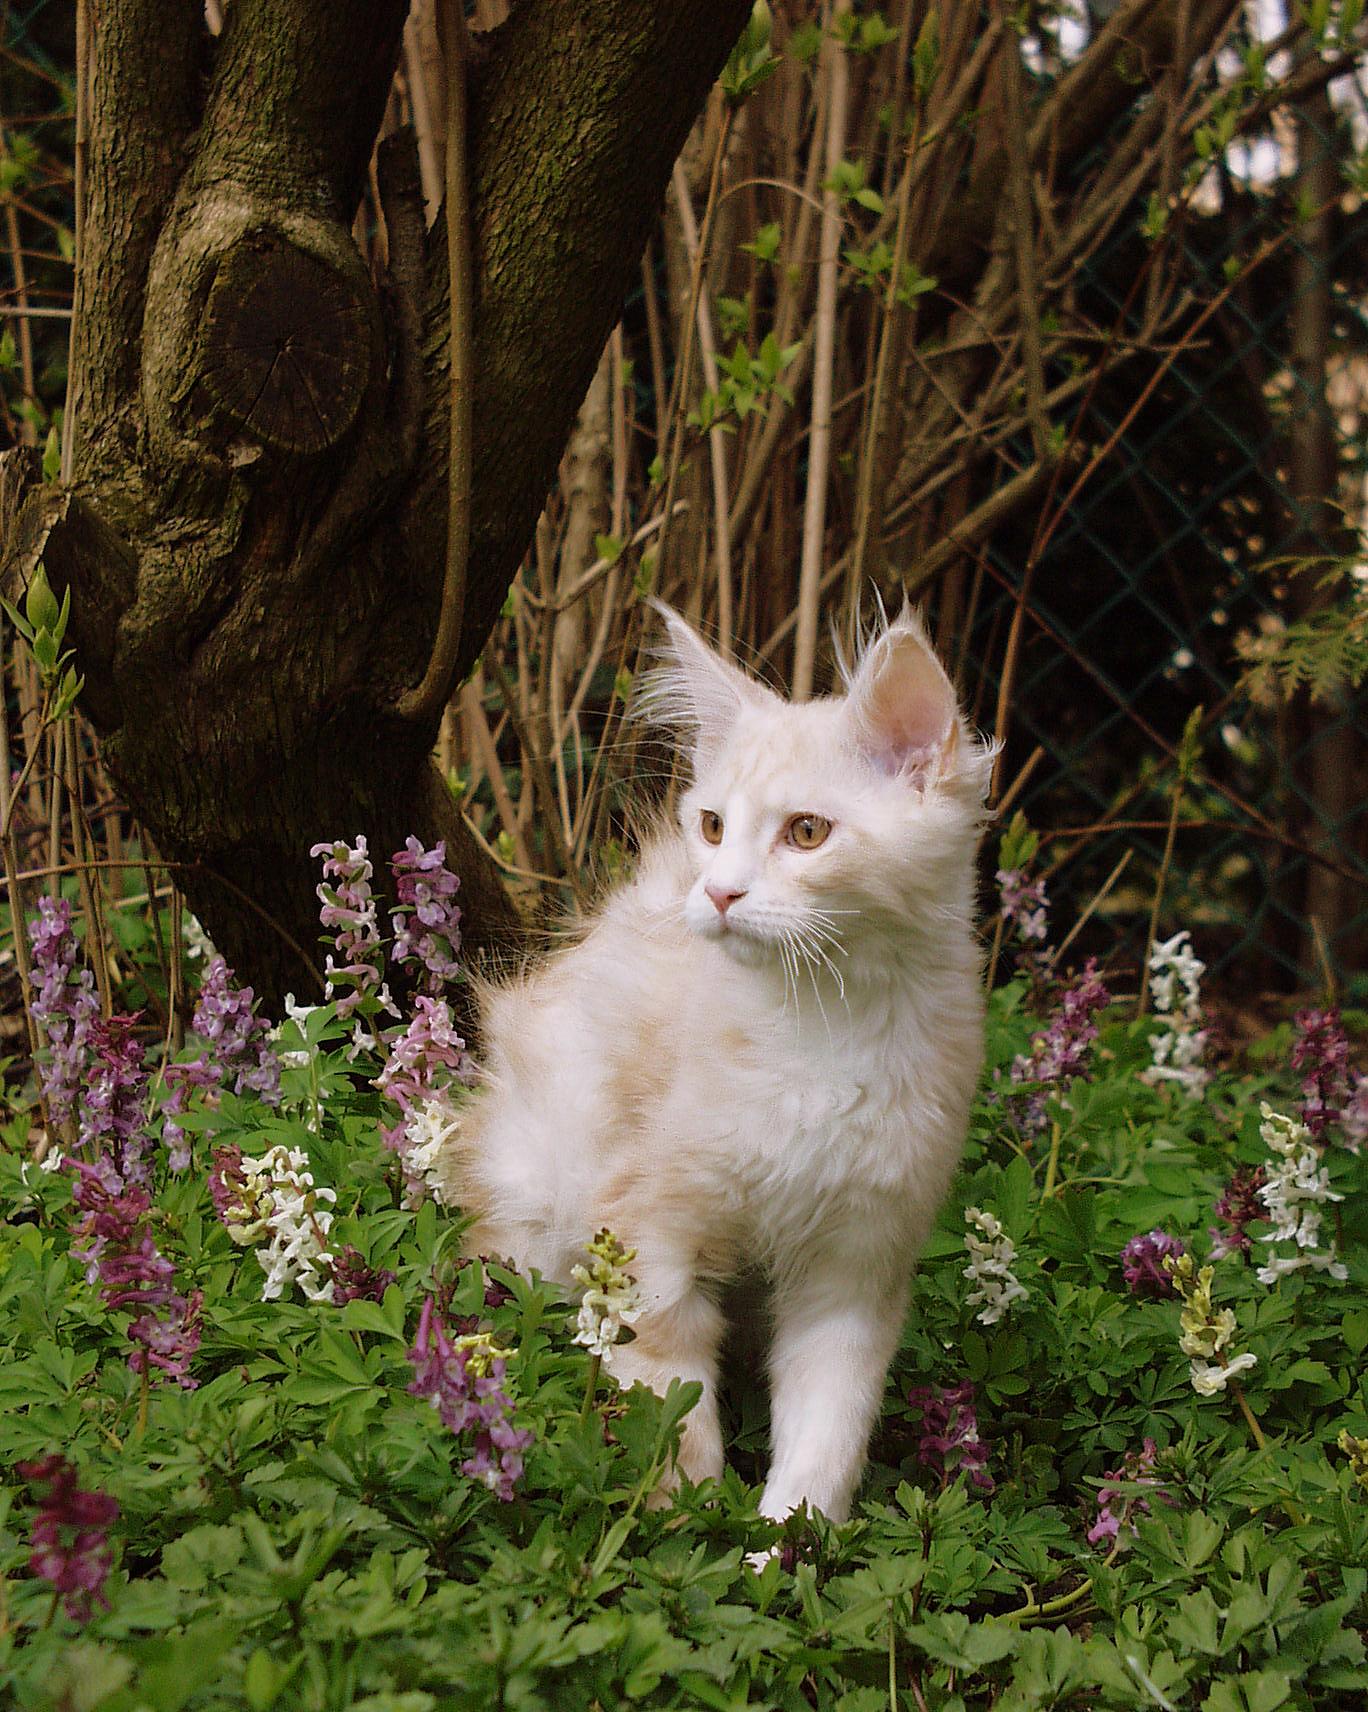 Fichier:Maine Coon Kitten.JPG — Wikipédia Tabby Norwegian Forest Cat